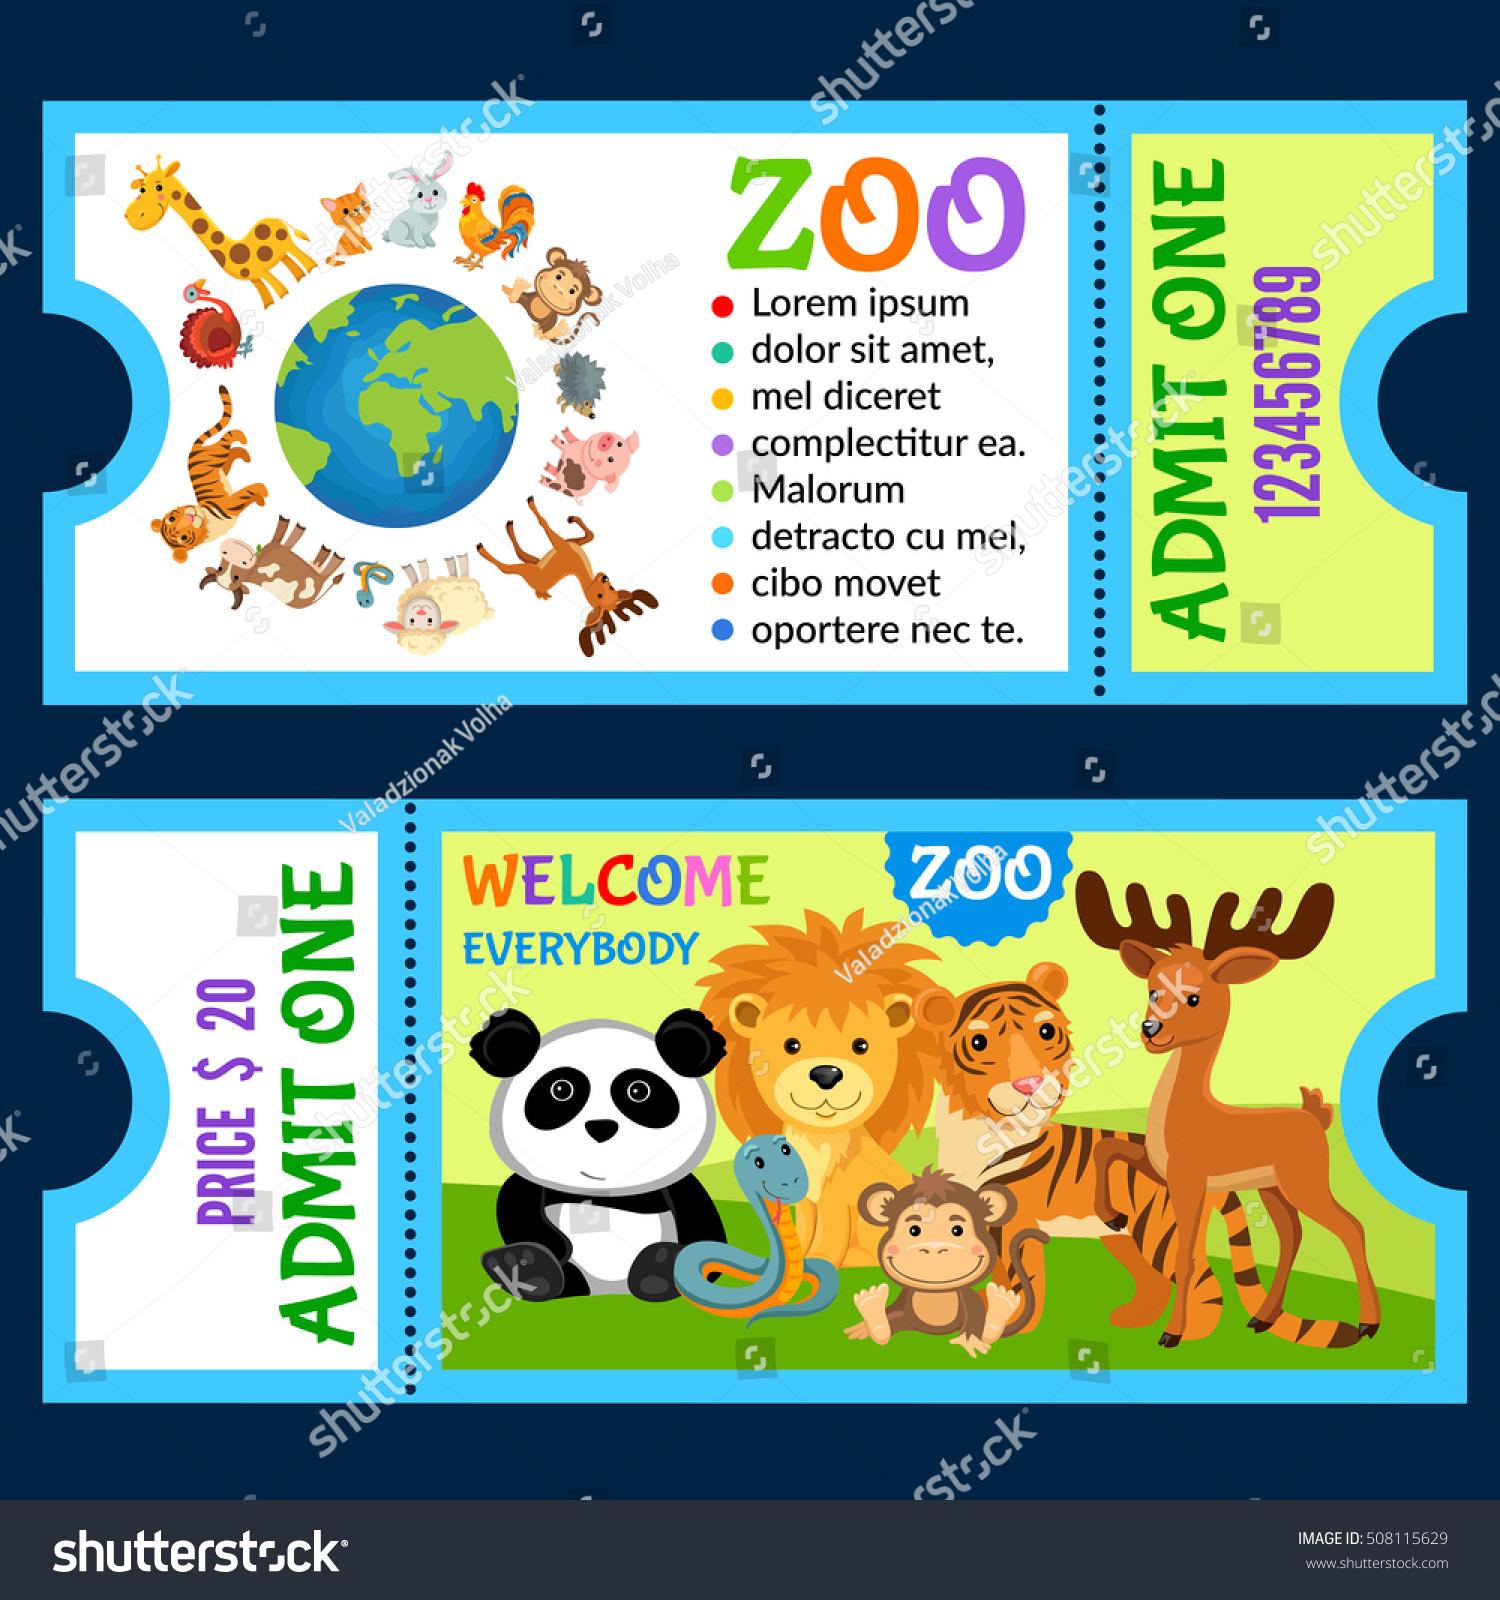 Vector illustration animals jungle ticket invitation stock vector vector illustration animals jungle ticket invitation stock vector 508115629 shutterstock stopboris Images